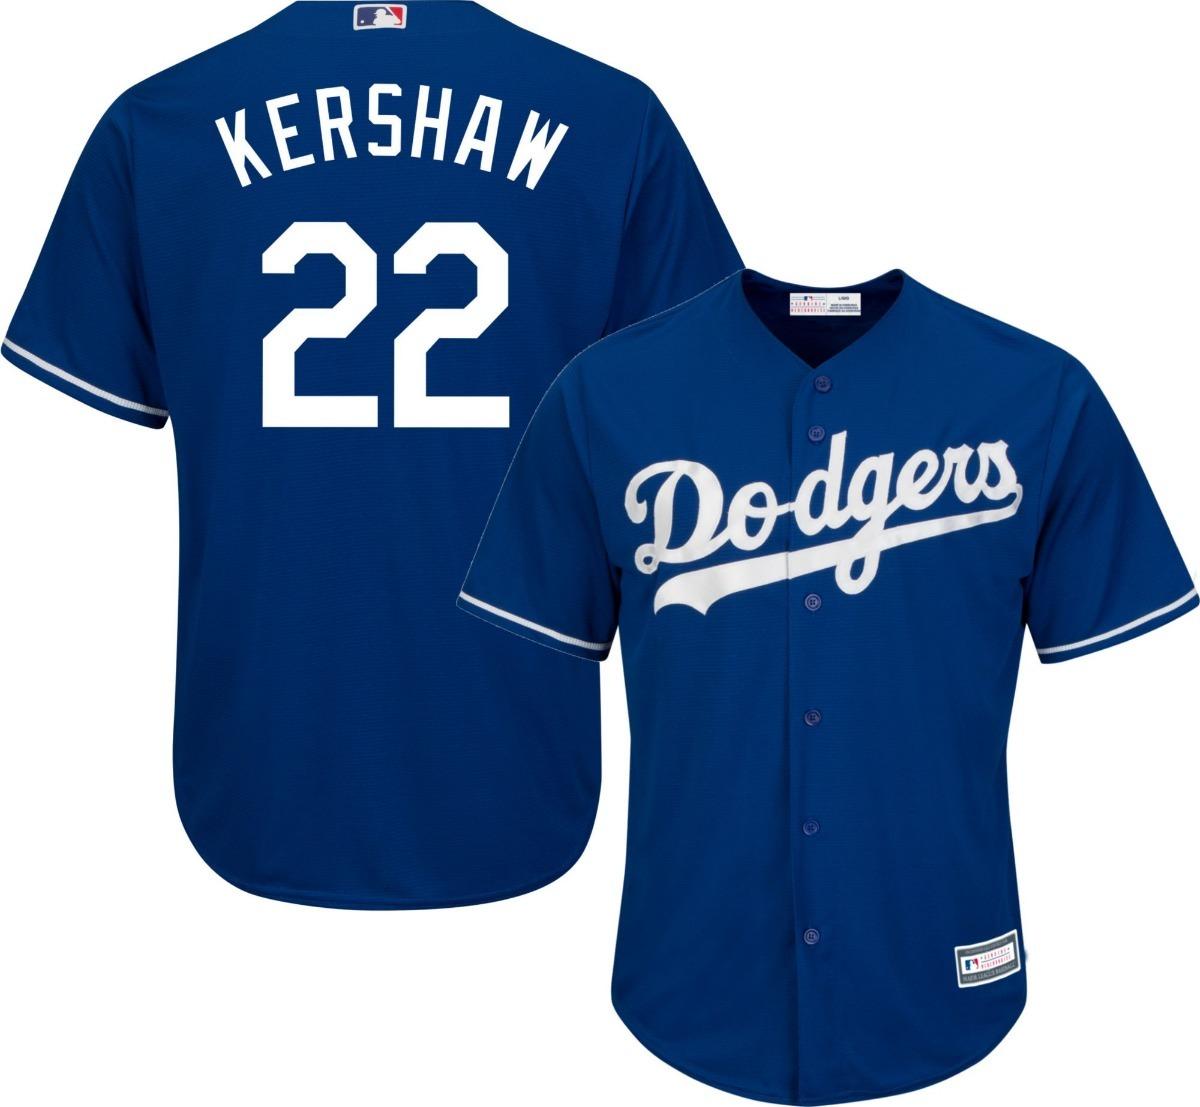 9cdac8aae camiseta baseball mlb los angeles dodgers negra y azul. Cargando zoom.